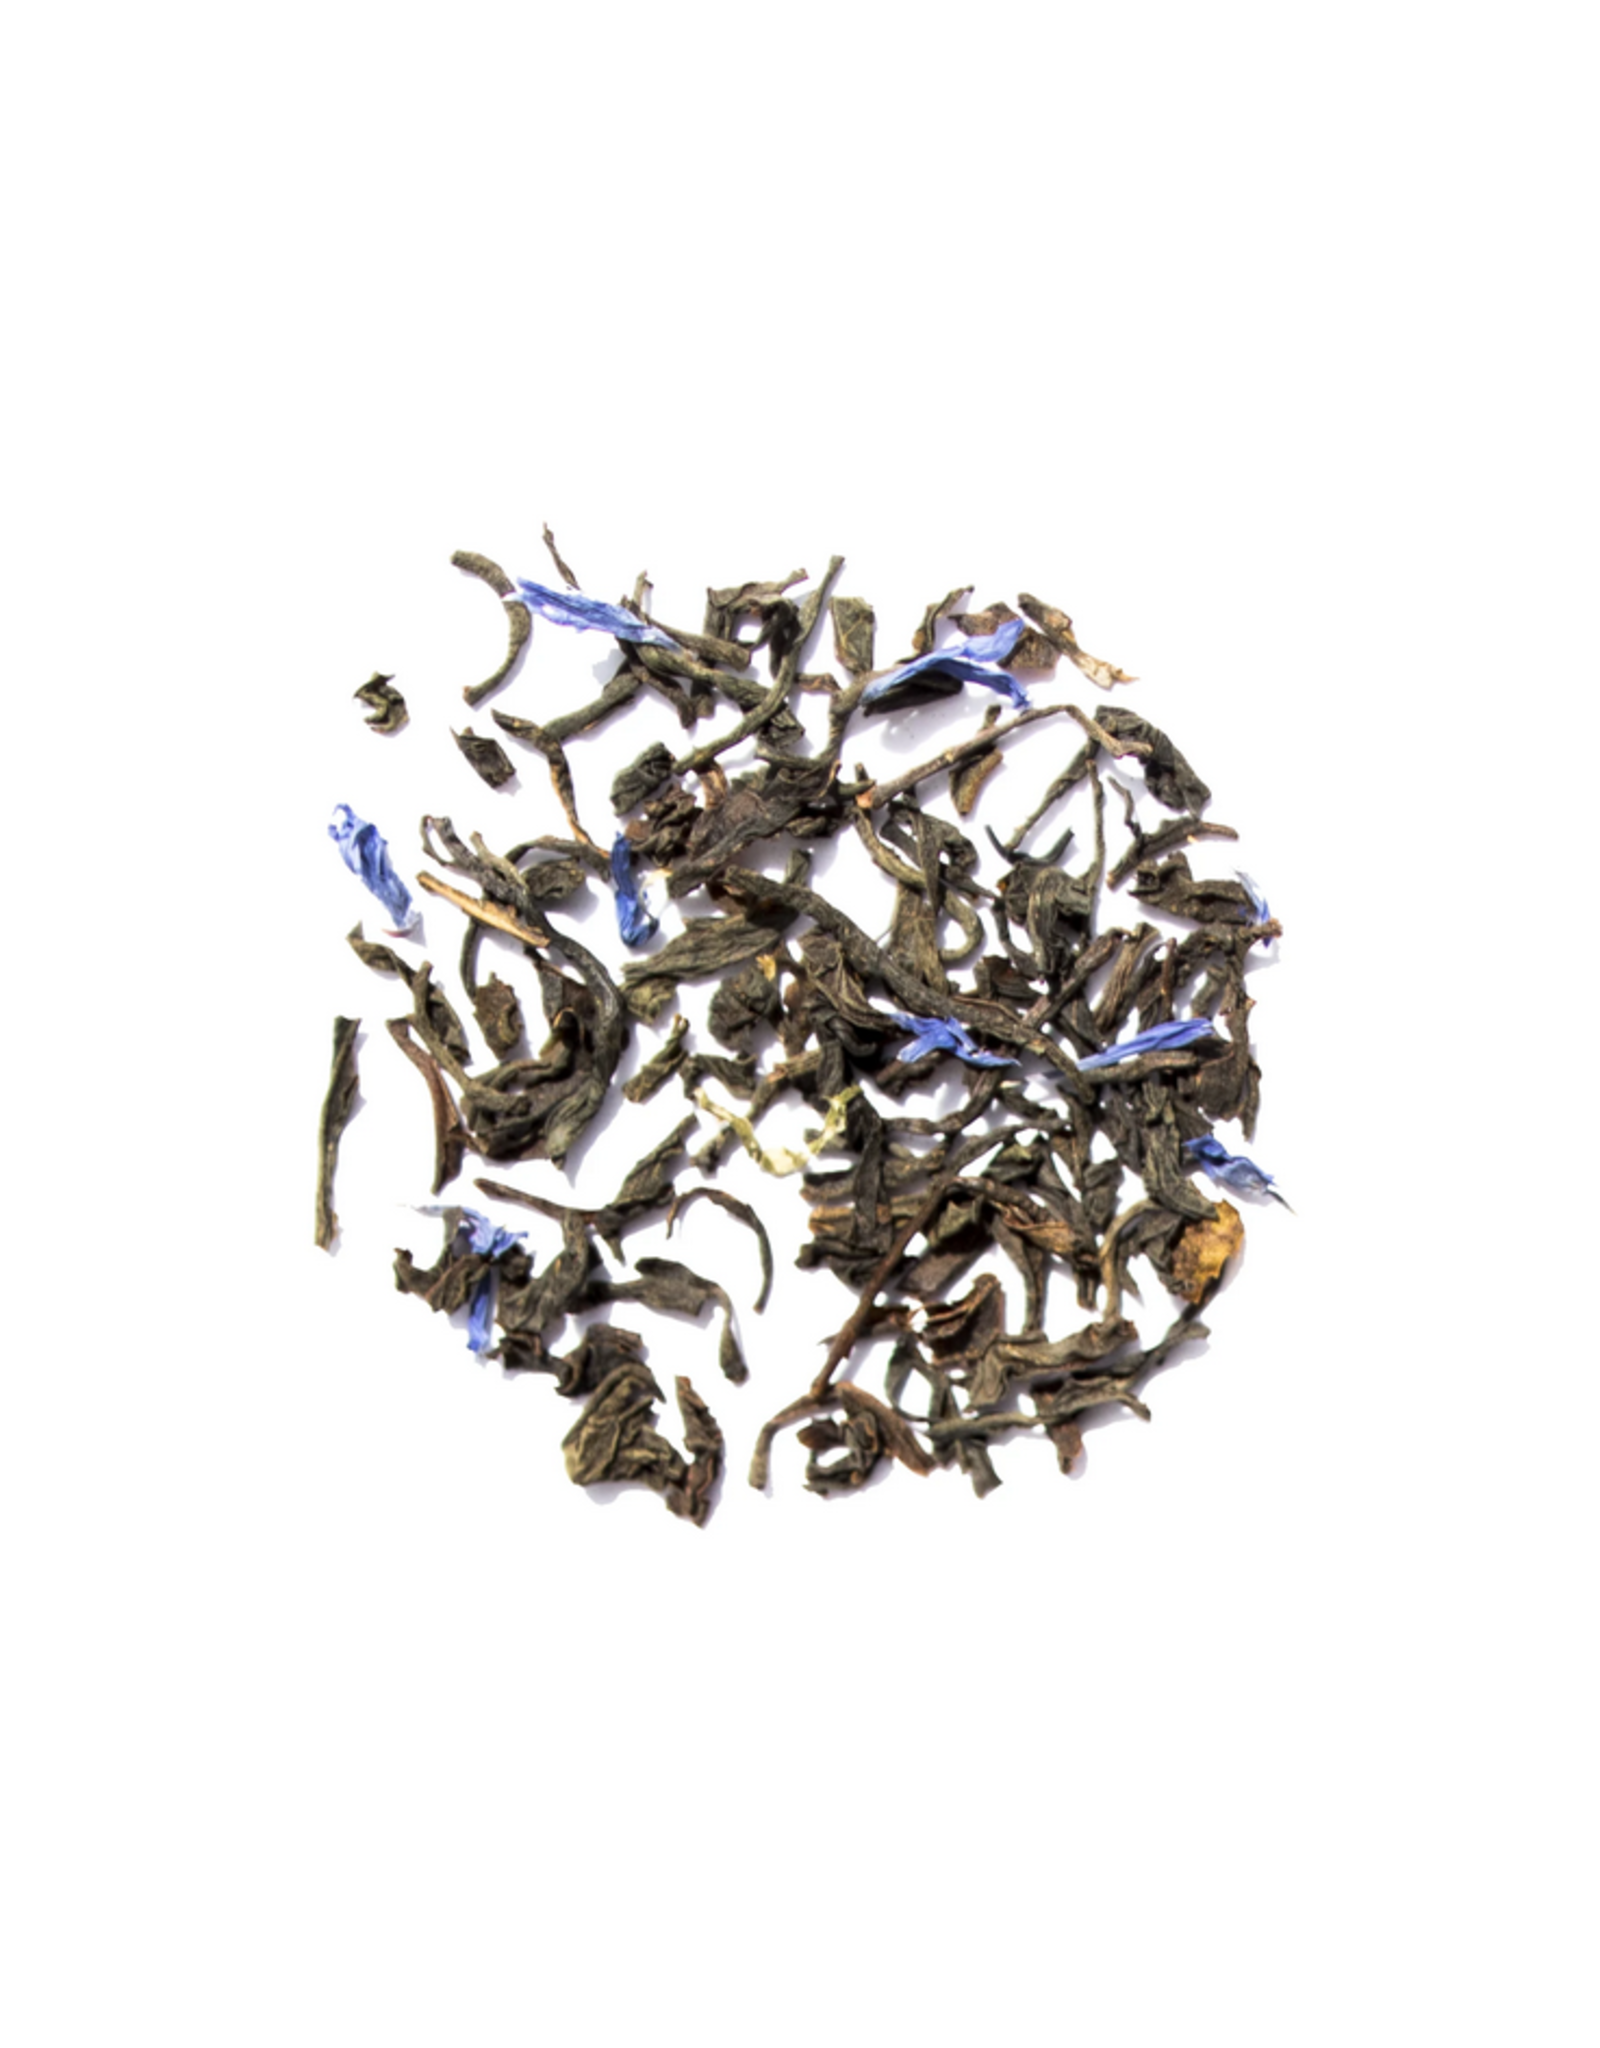 Genuine Tea Genuine Tea, Cream of Earl Grey 50g Loose